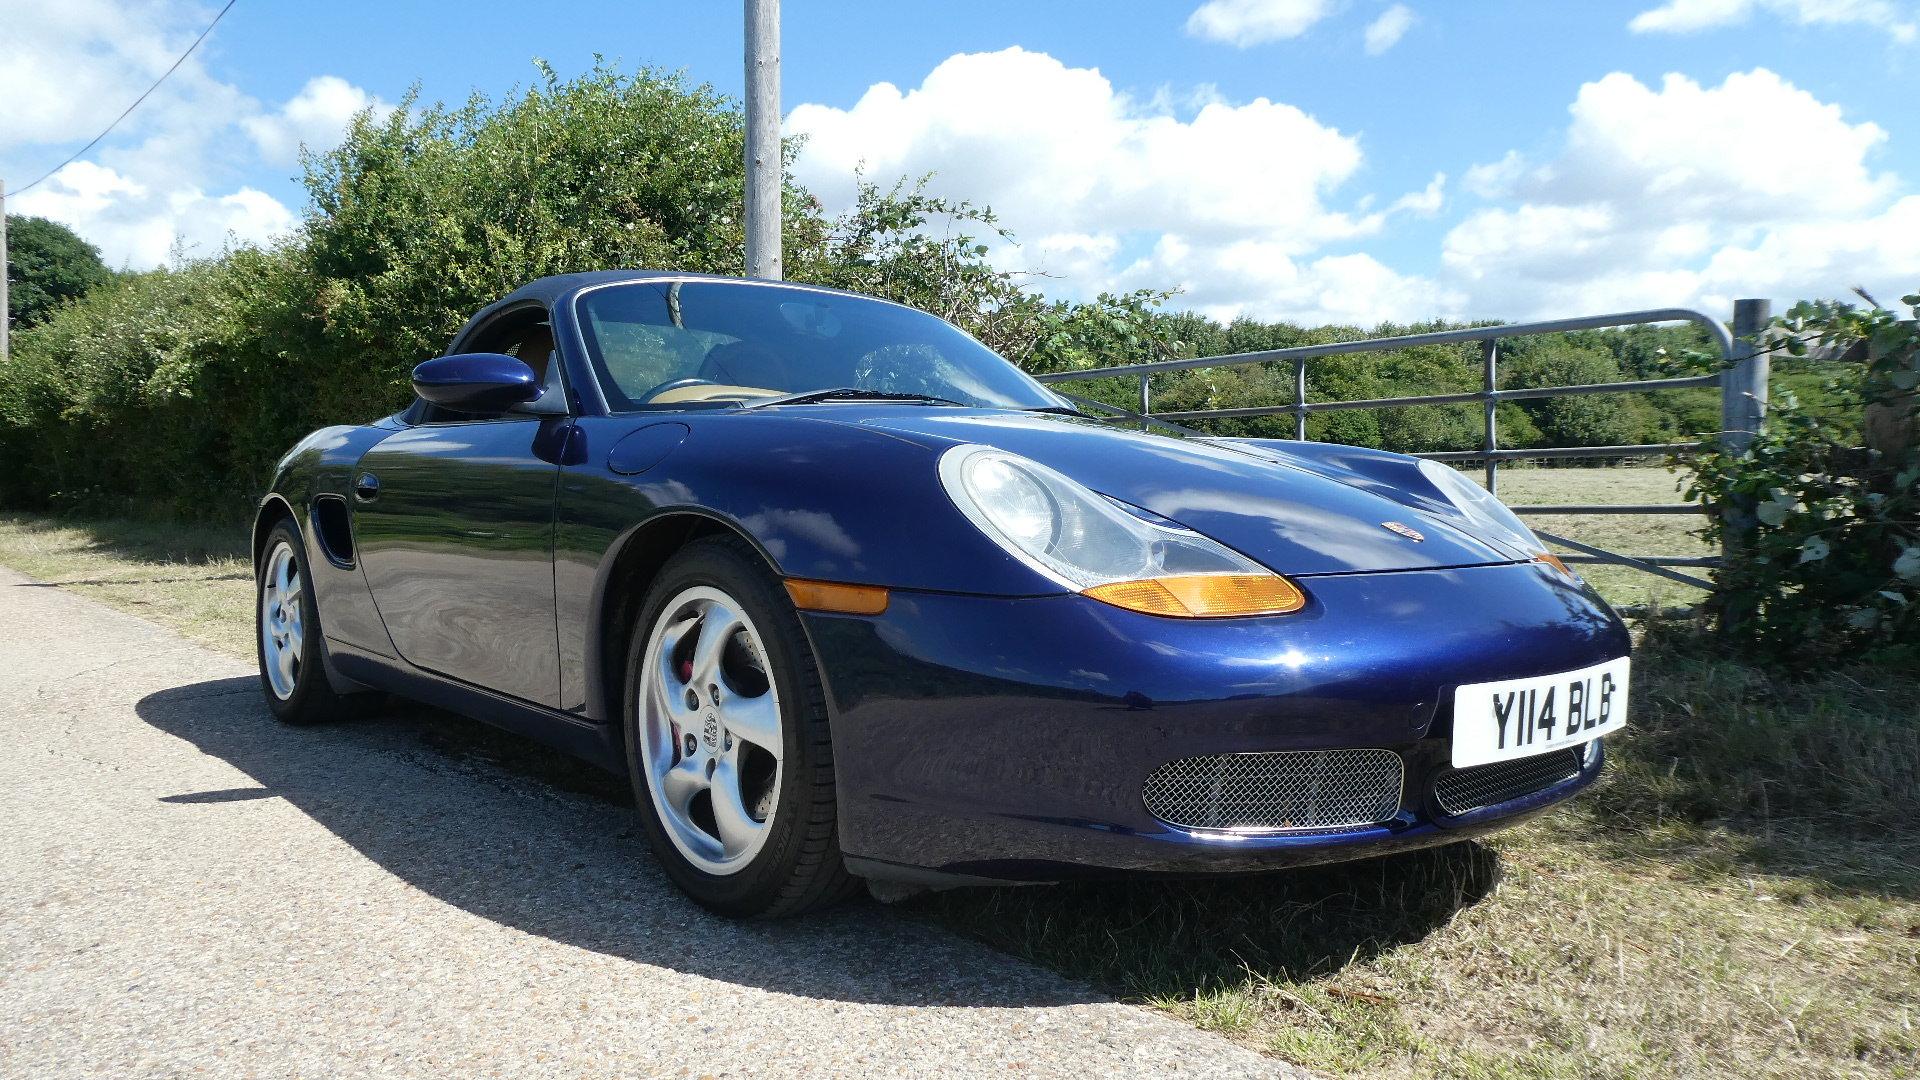 2001 Porsche Boxster S  3.2 litre Convertible  SOLD (picture 1 of 6)